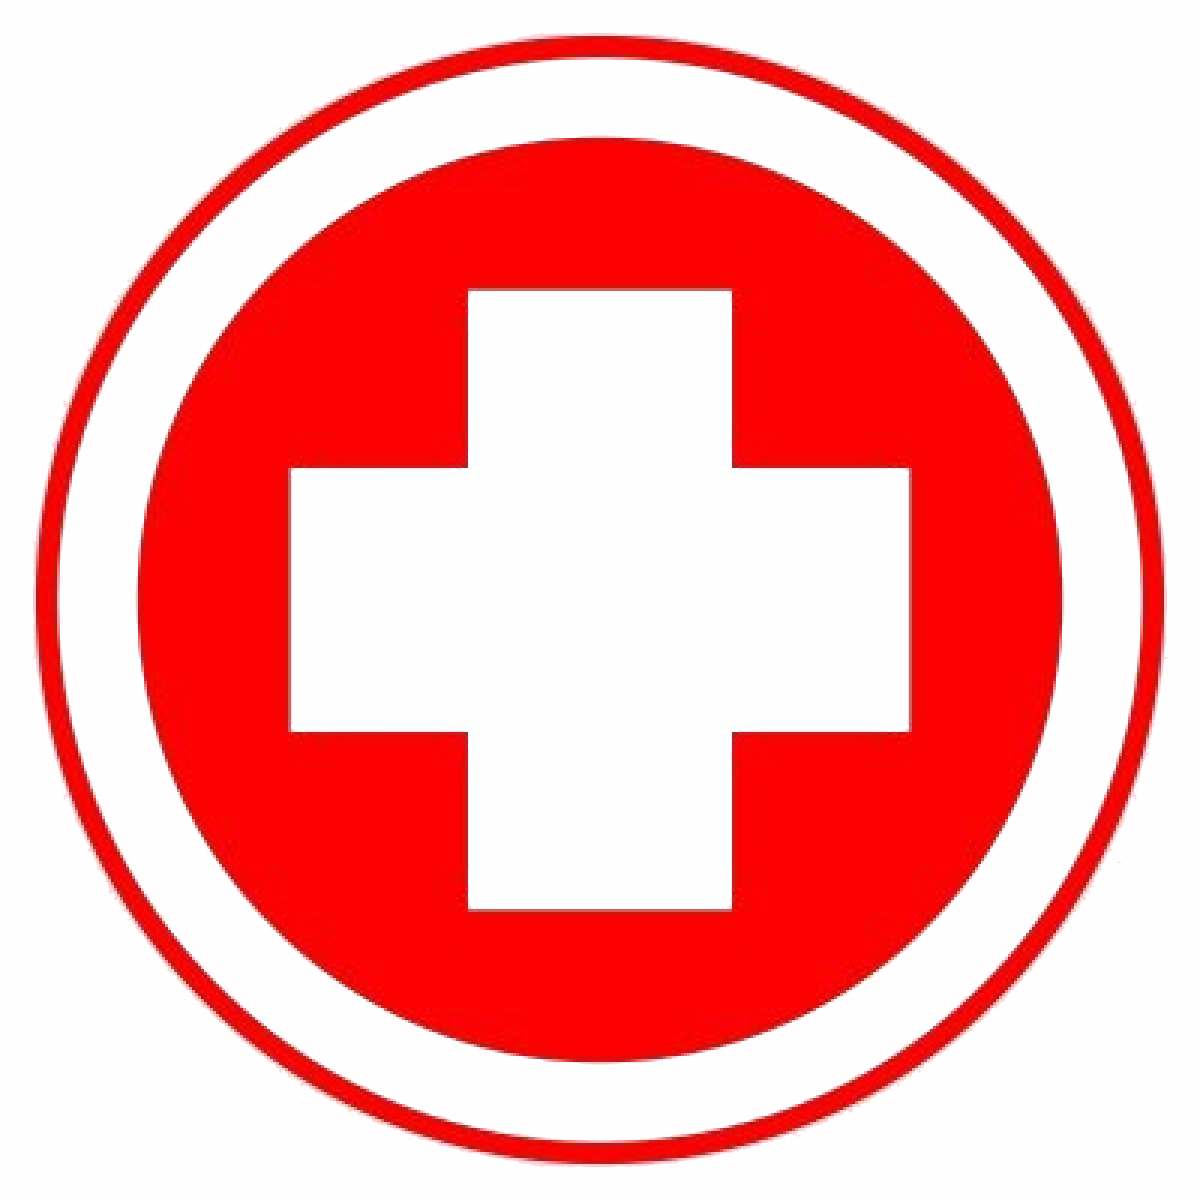 70 Medical Symbol Snake Cross Meaning Snake Cross Symbol Meaning